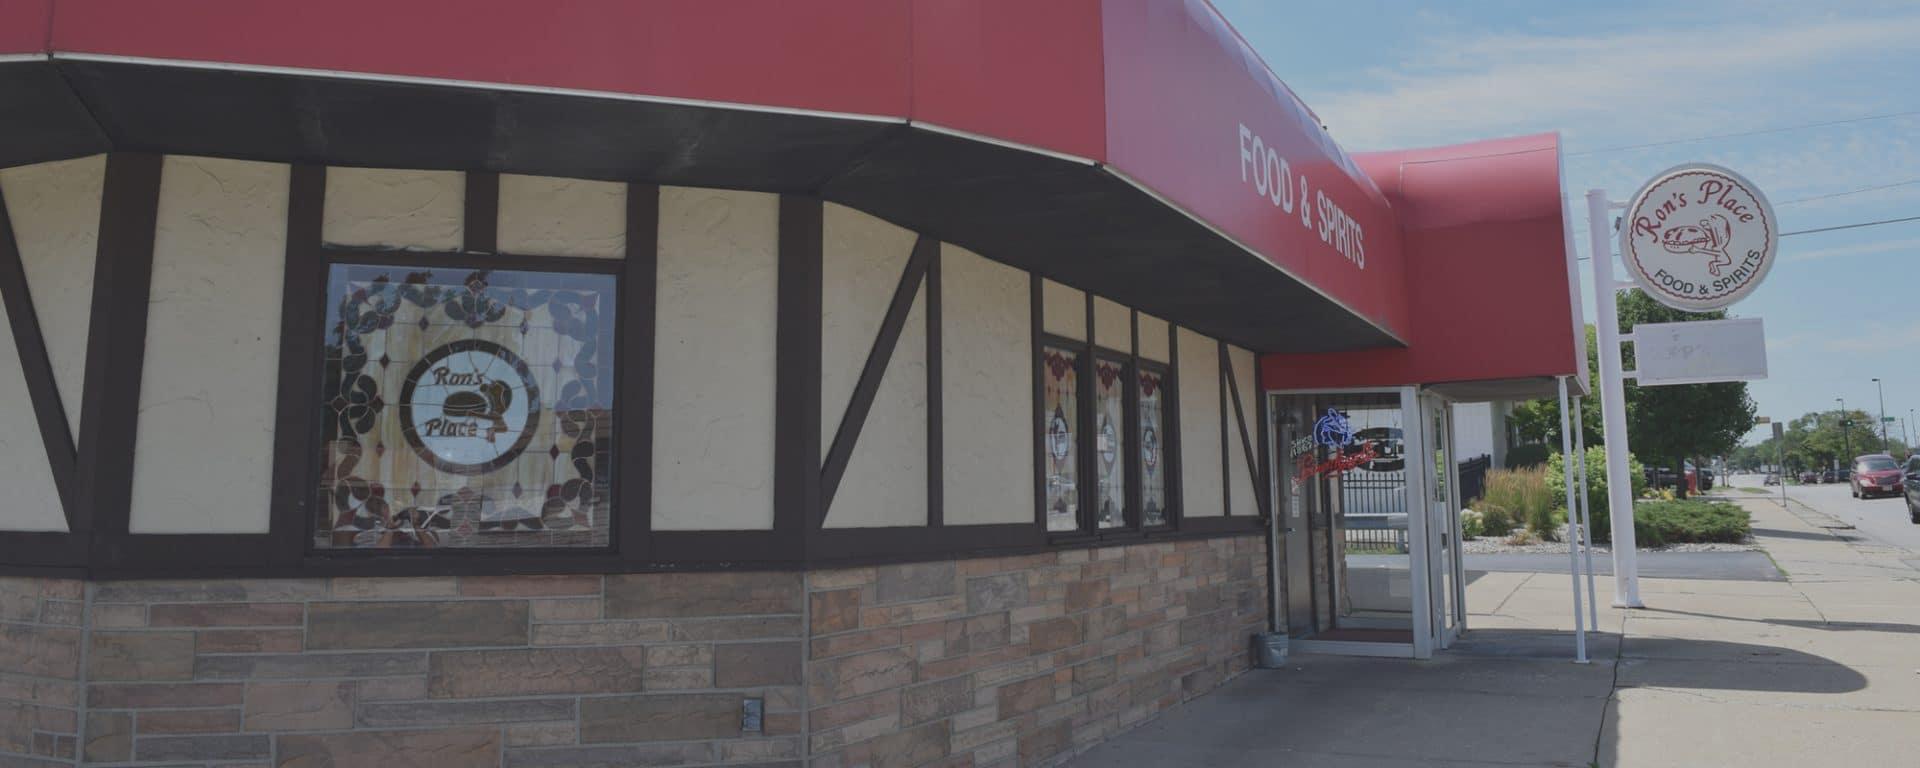 rons place kenosha, best burger kenosha, bar & grill kenosha